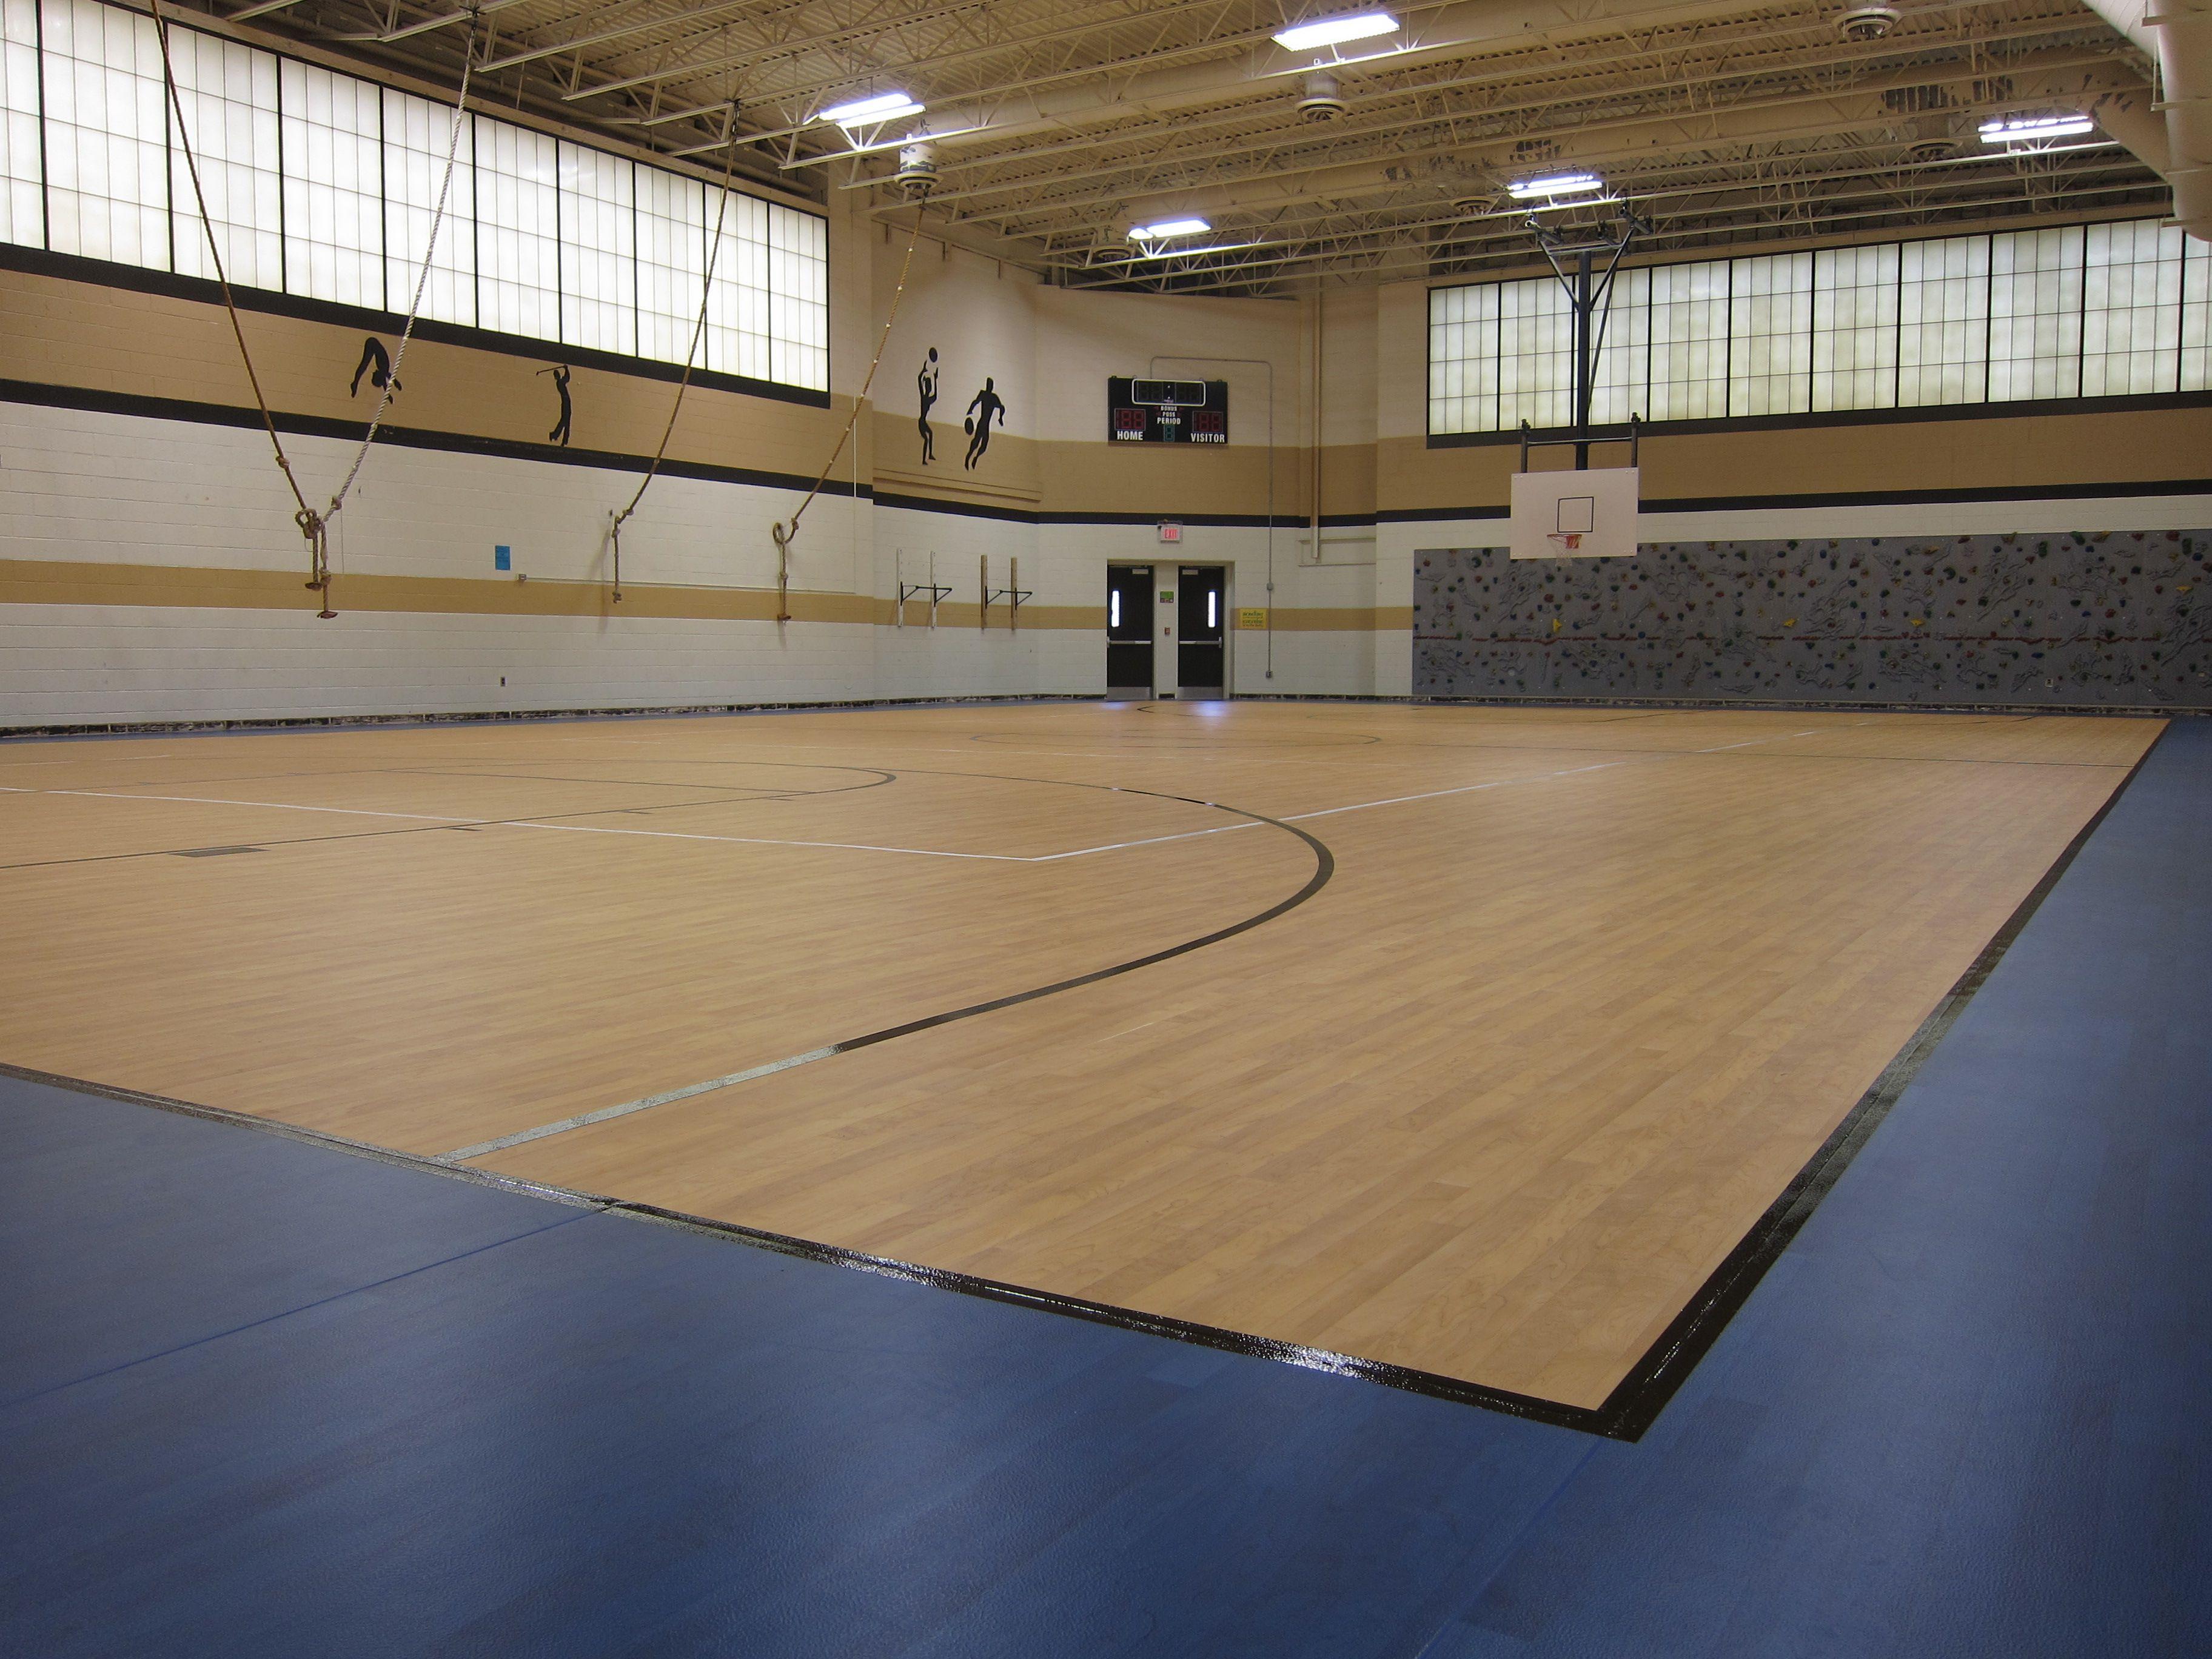 Tarkett Sports Omnisports 8 3 In Maple And Blue Maple Sports Indoor Sports Indoor